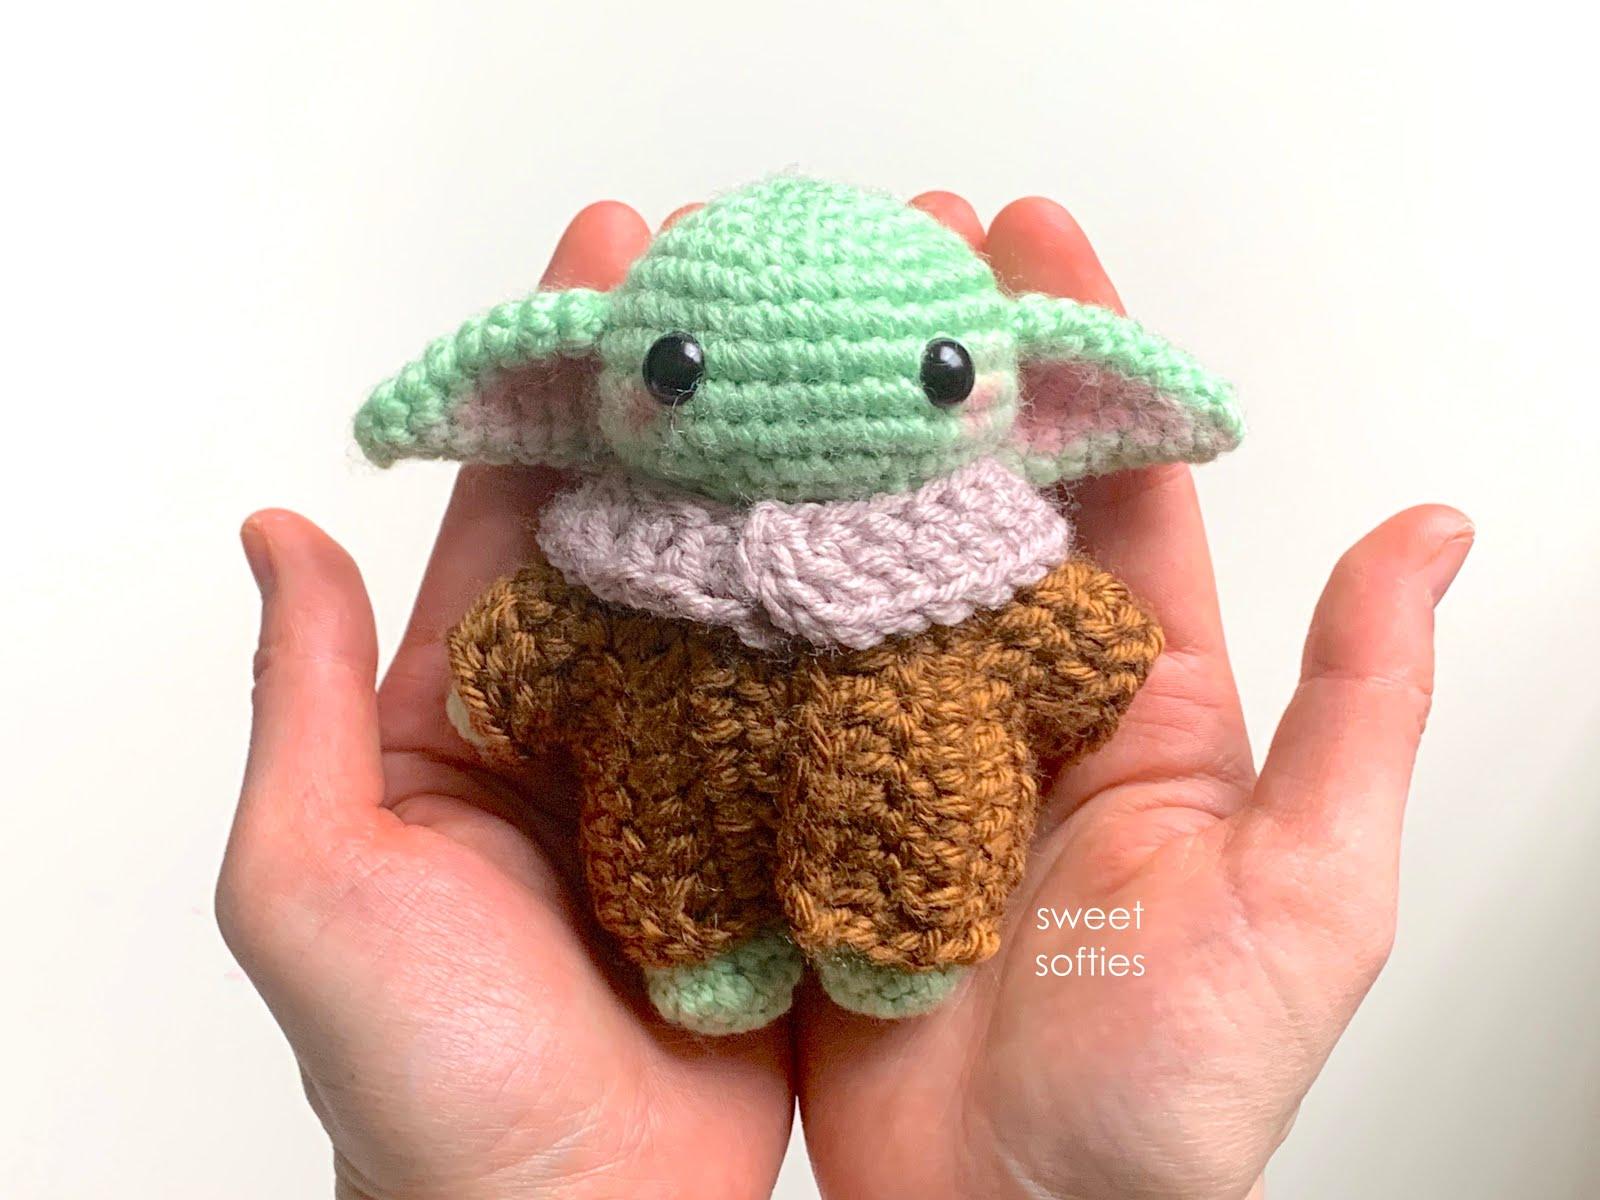 Lovely fat bear amigurumi free crochet pattern - Amigu World | 1200x1600